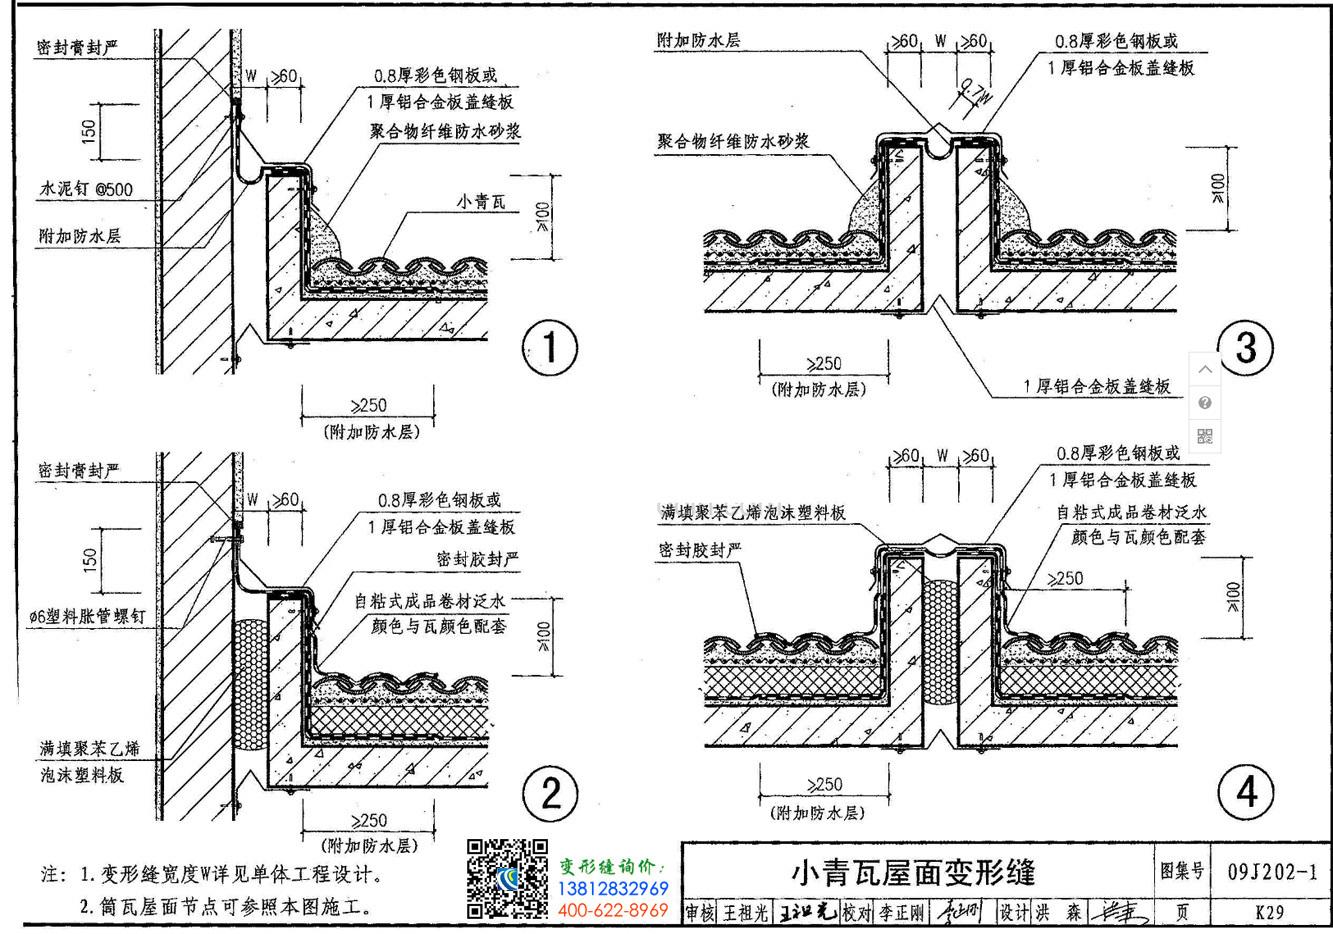 09J202-1图集K29页